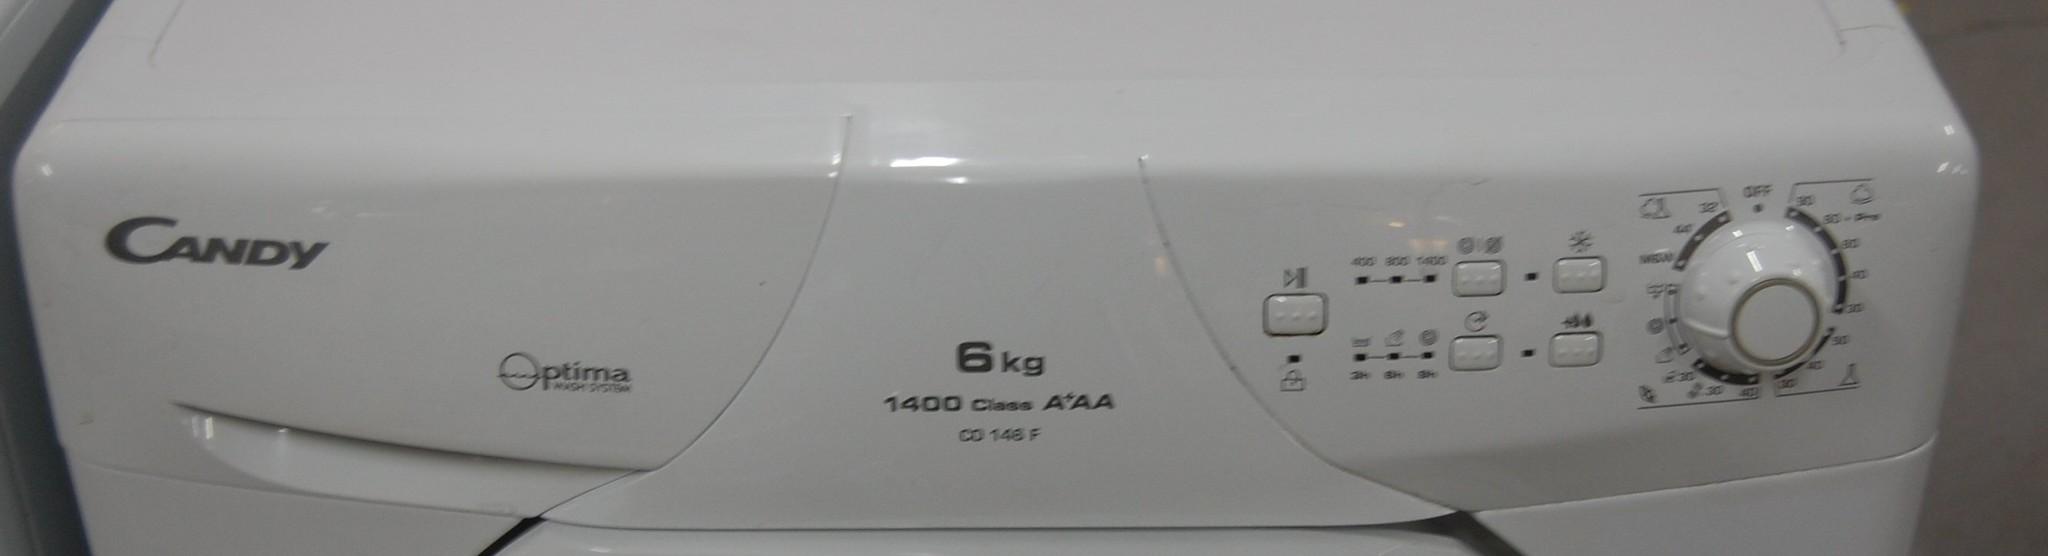 Gebruikte Candy Optima CO 146F  /2-14S   A+AA